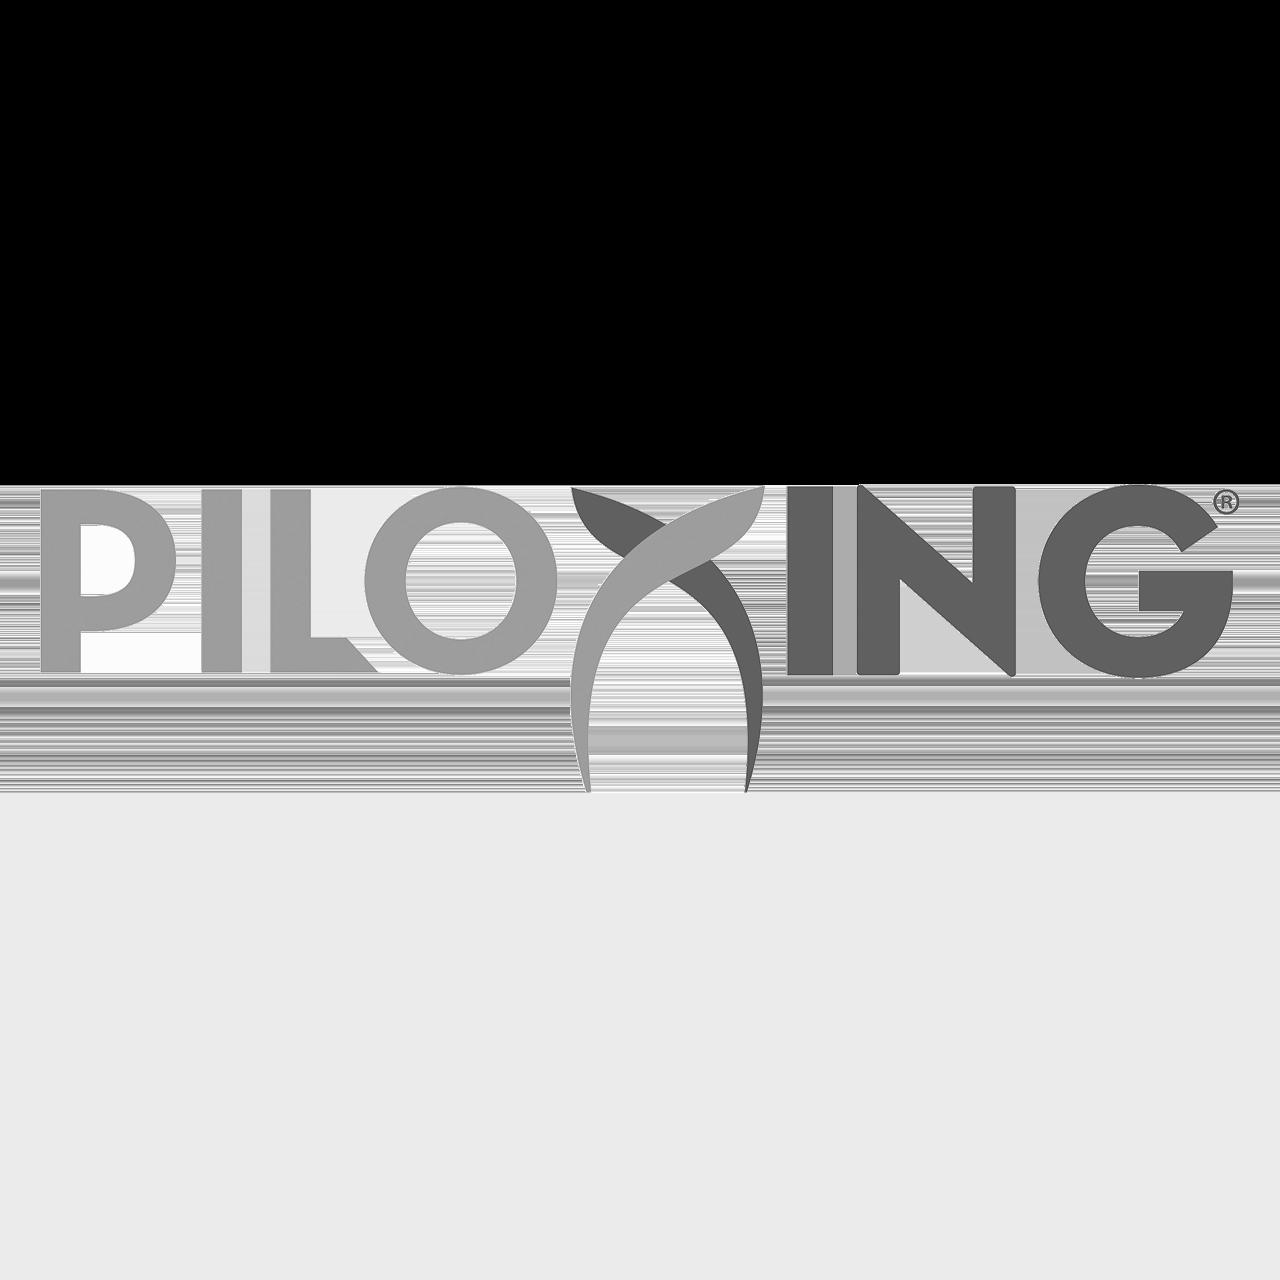 Logo Piloxing